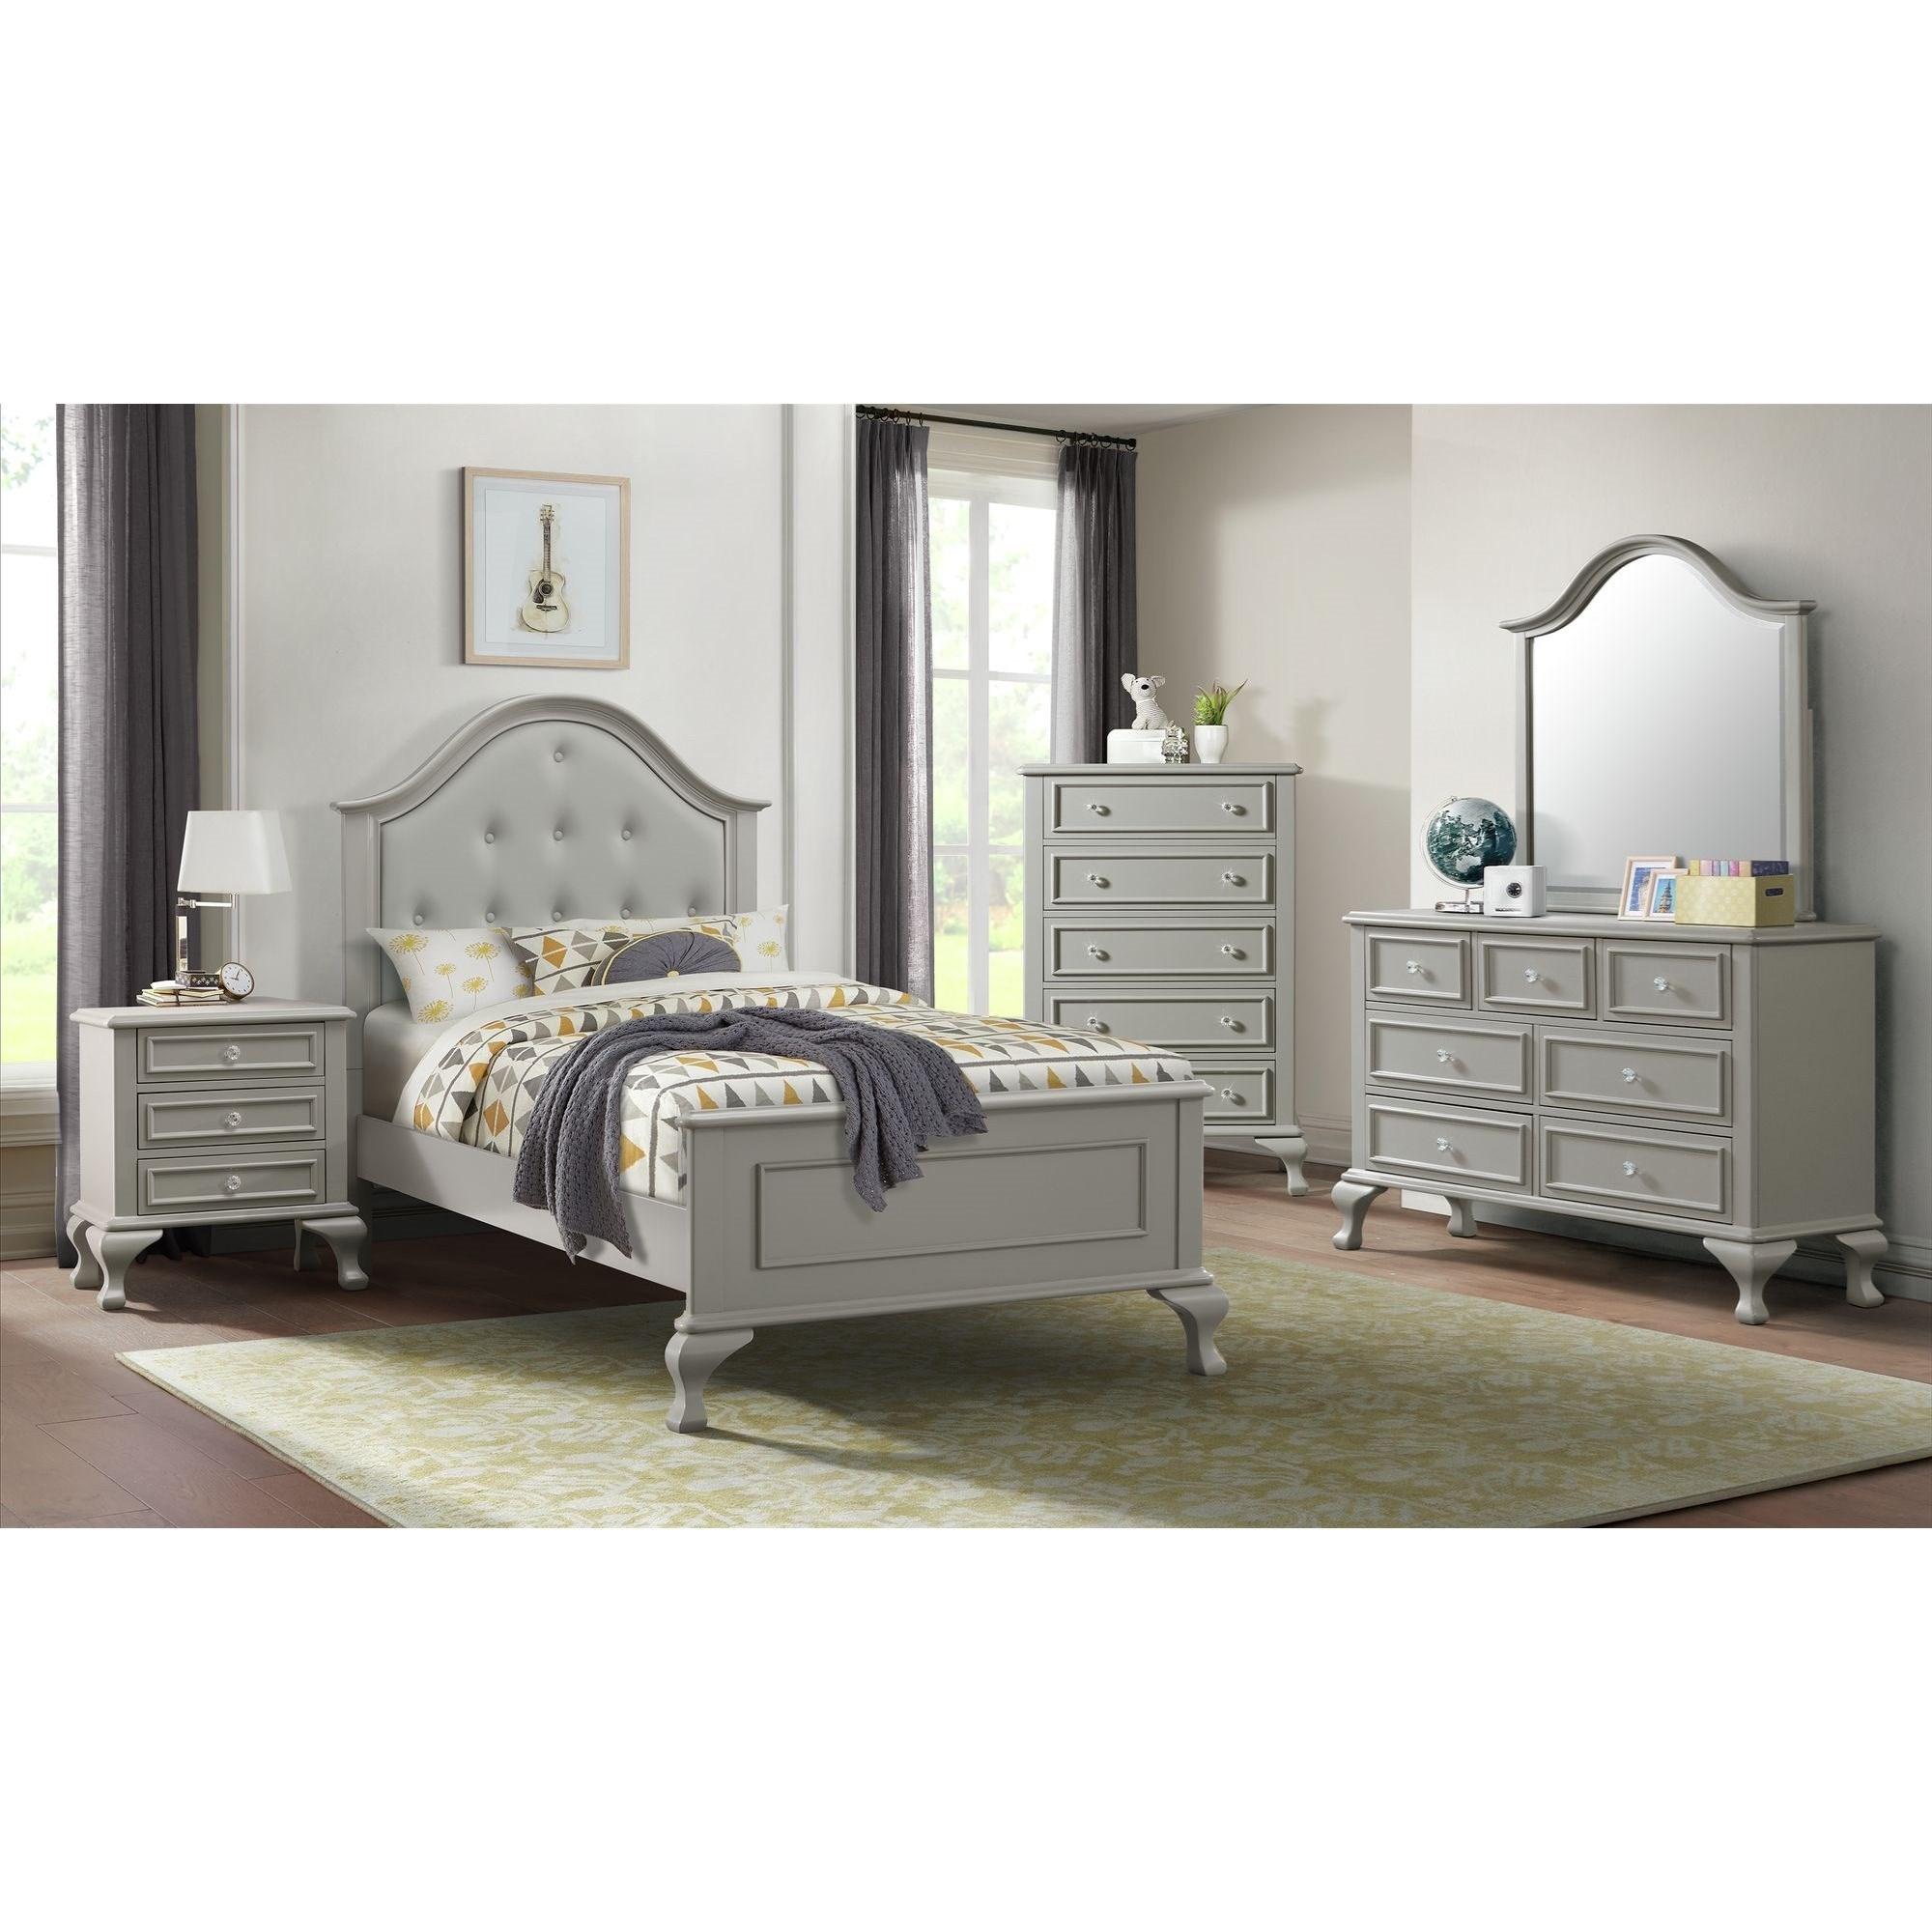 Jesse Bedroom Group by Elements International at Bullard Furniture